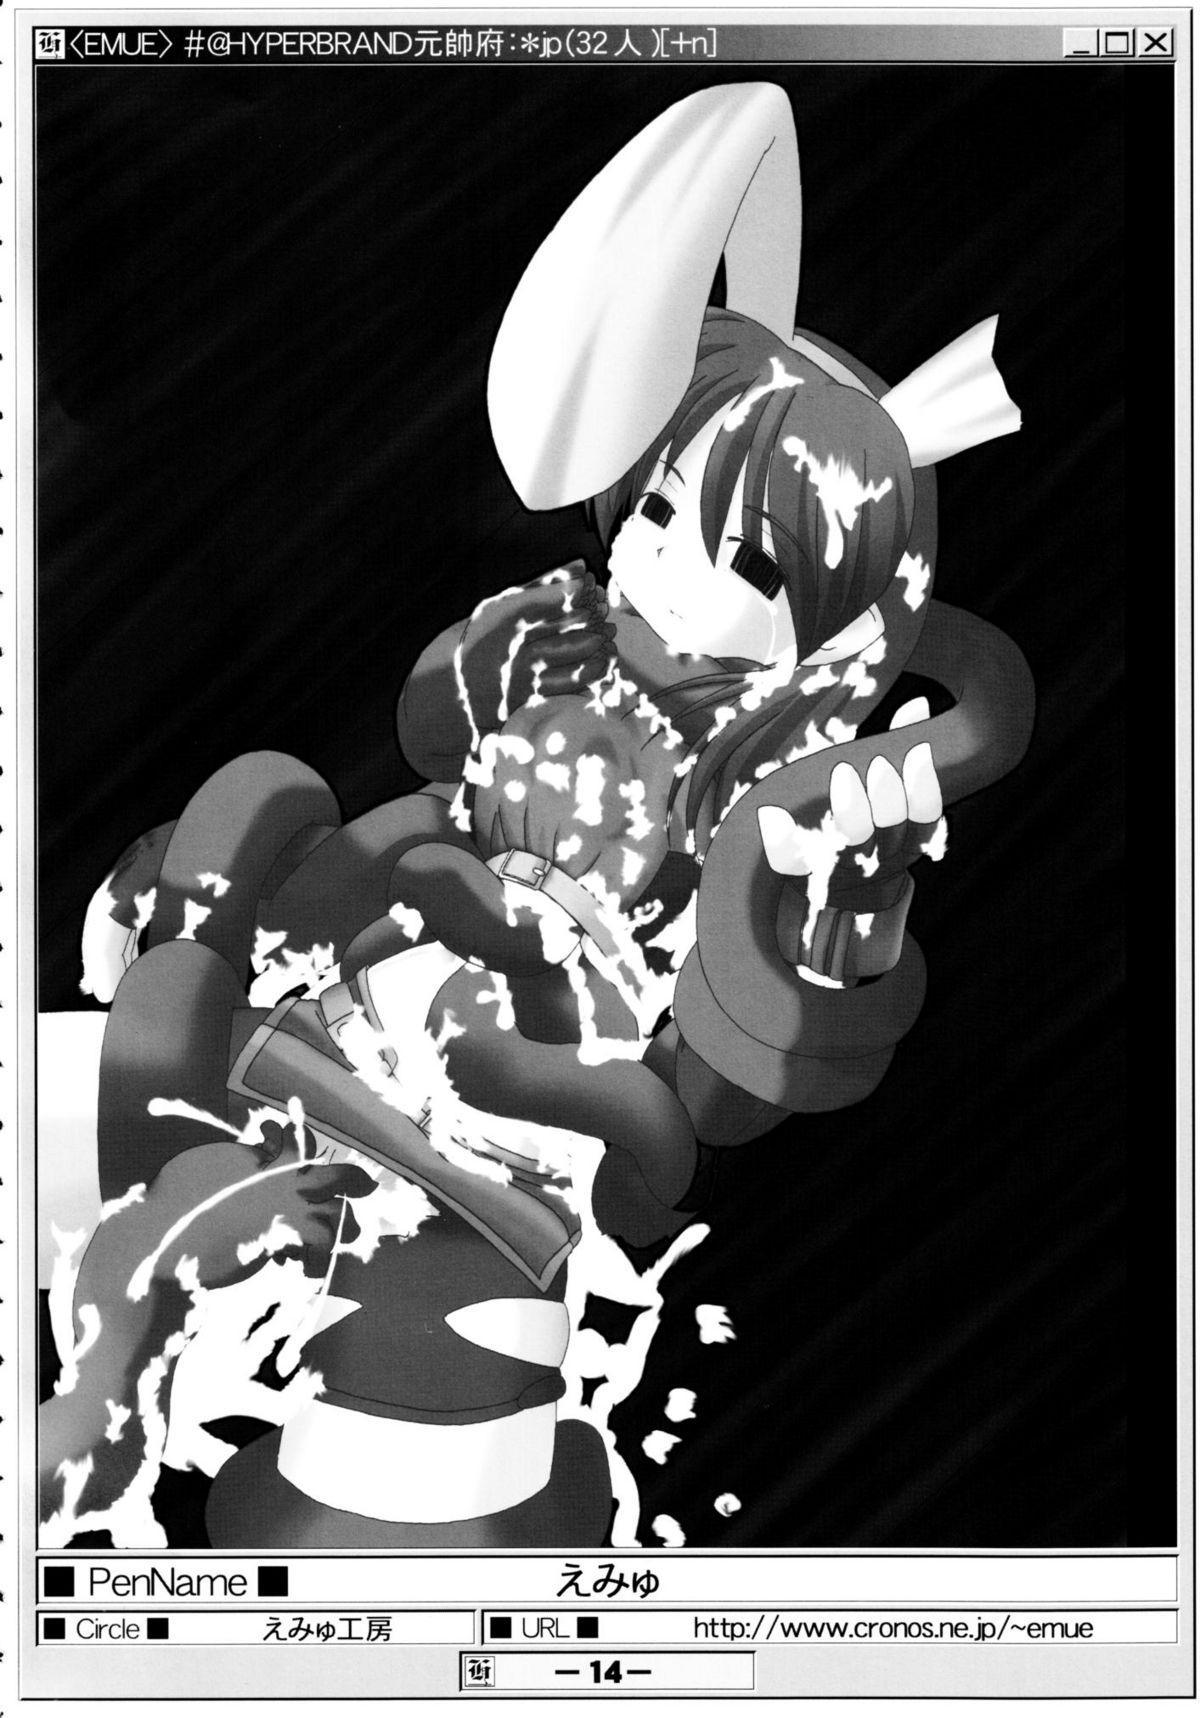 (Puniket 07) [HYPER BRAND (Deden, Ishihara Masumi, Kawamura Yasuhito)]  (Ragnarok Online) 12